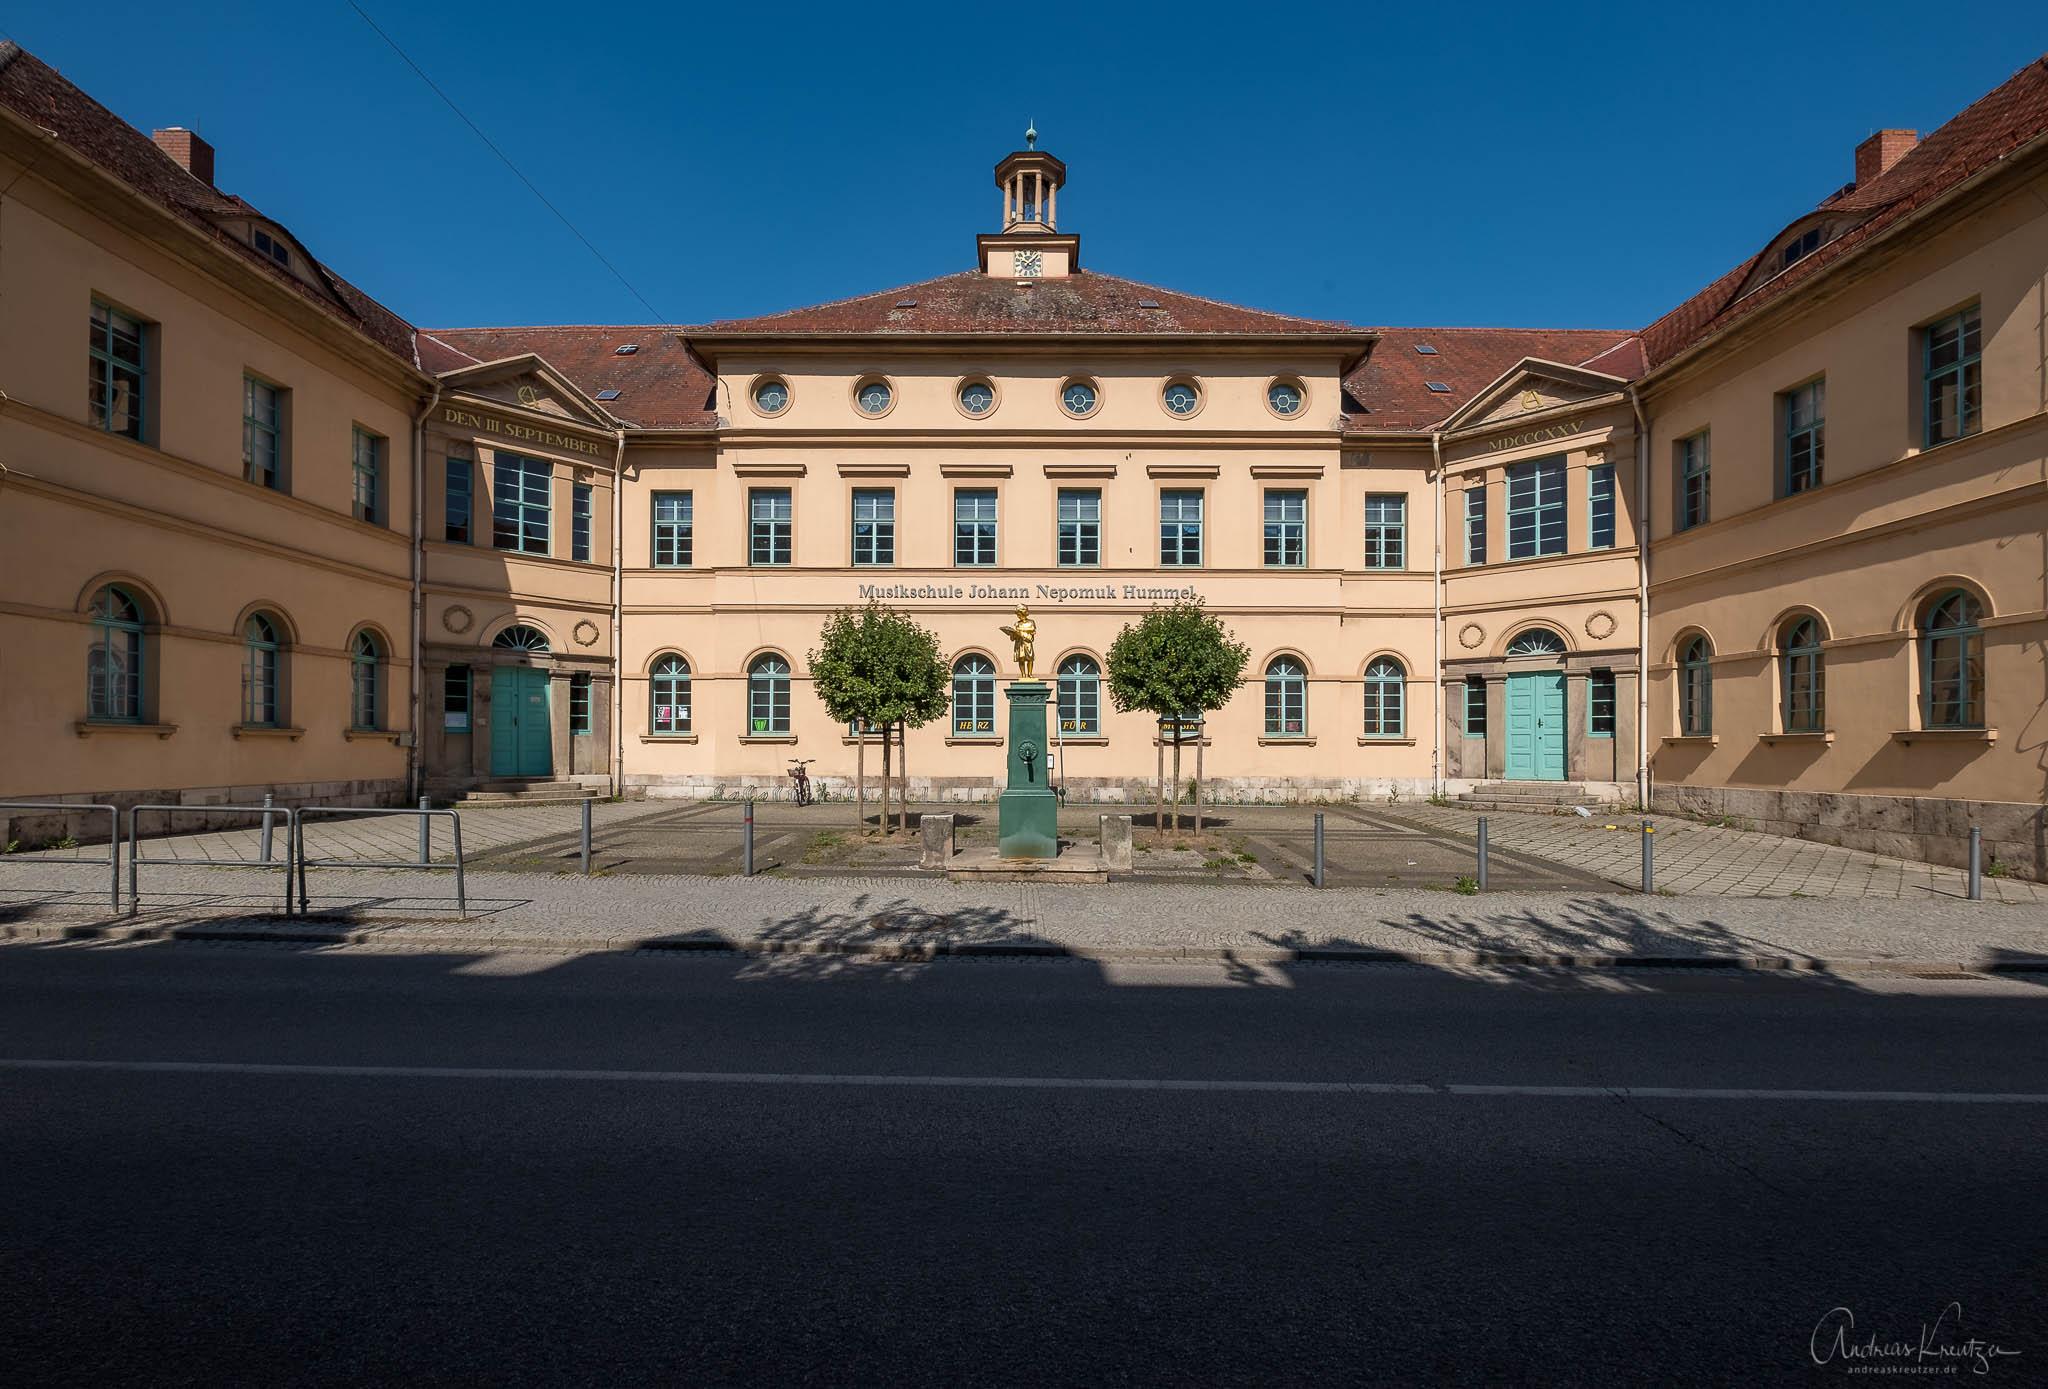 Musikschule Johann Nepomuk Hummel in Weimar